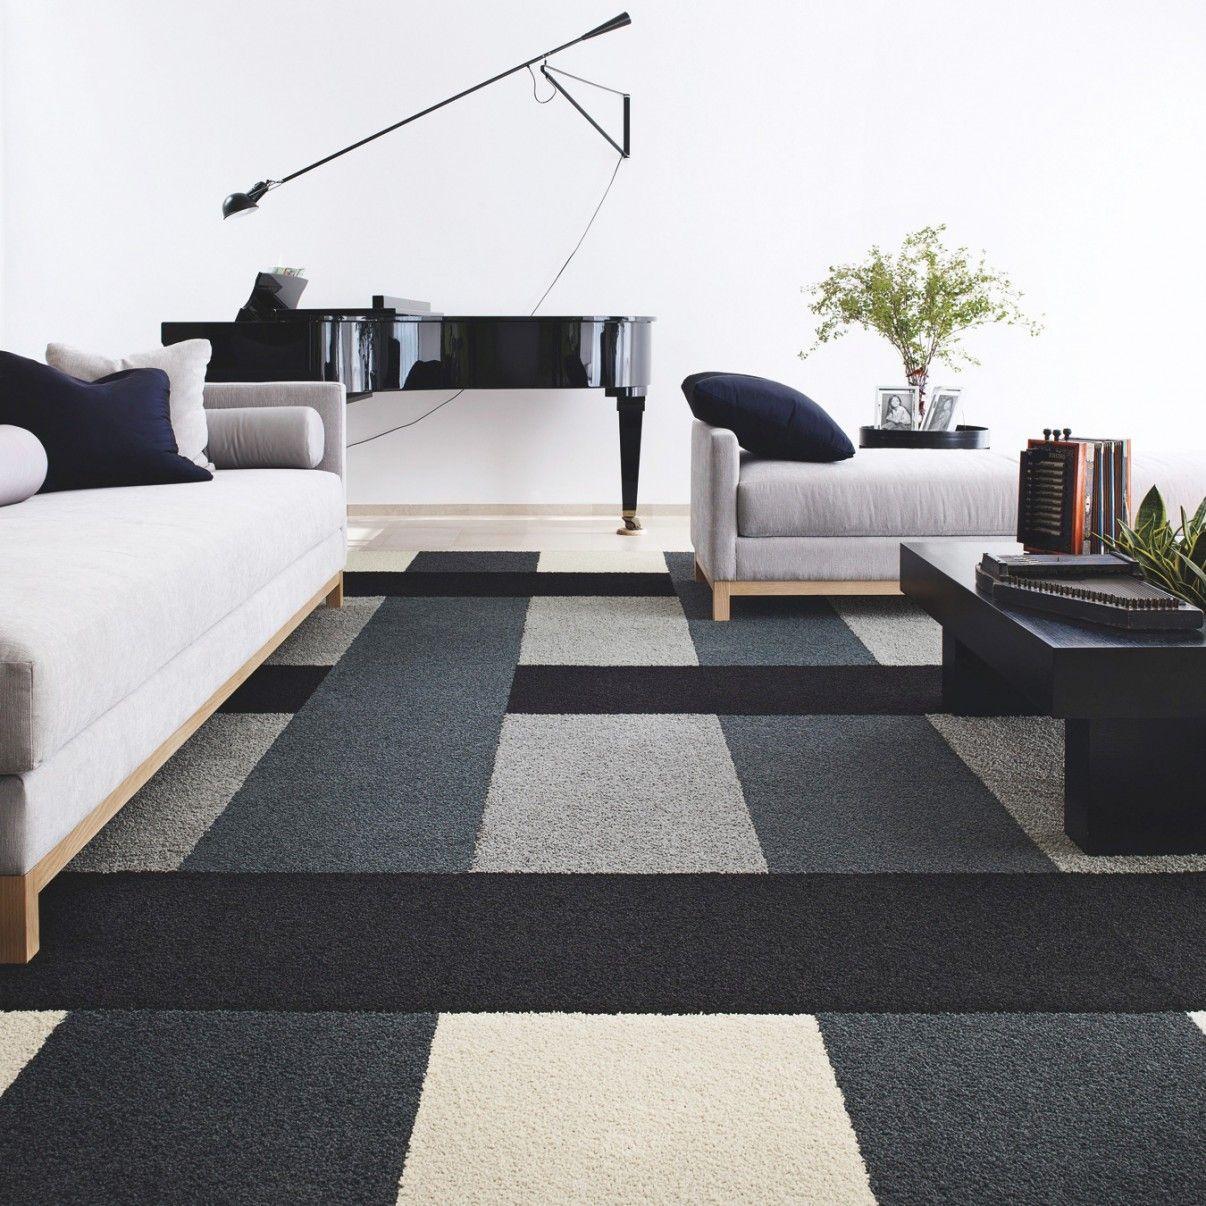 Rake Me Over  Commercial Flooring Living Room Flooring And Best Carpet Designs For Living Room 2018